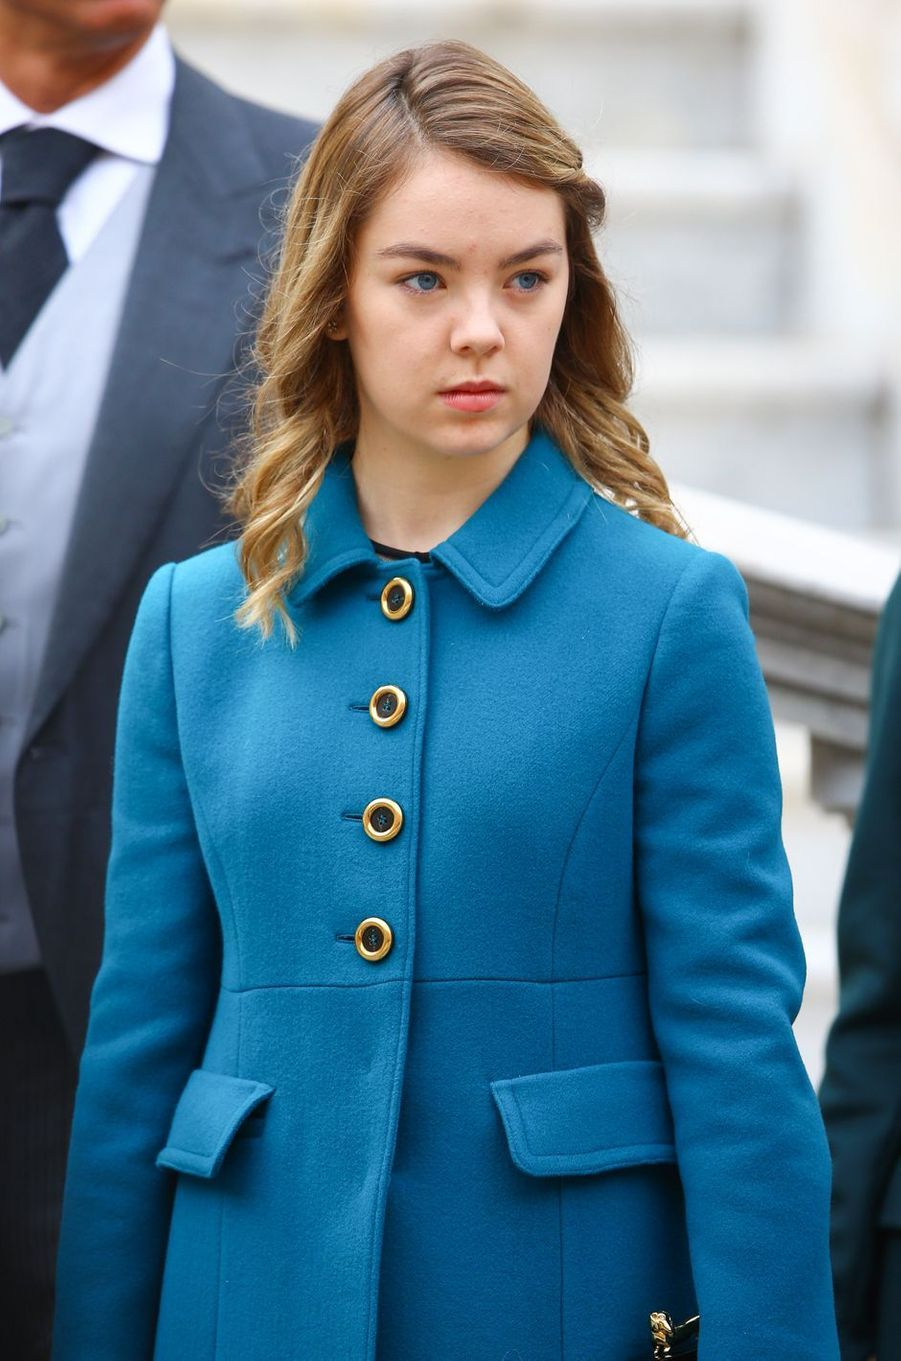 La princesse Alexandra de Hanovre à Monaco le 19 novembre 2016